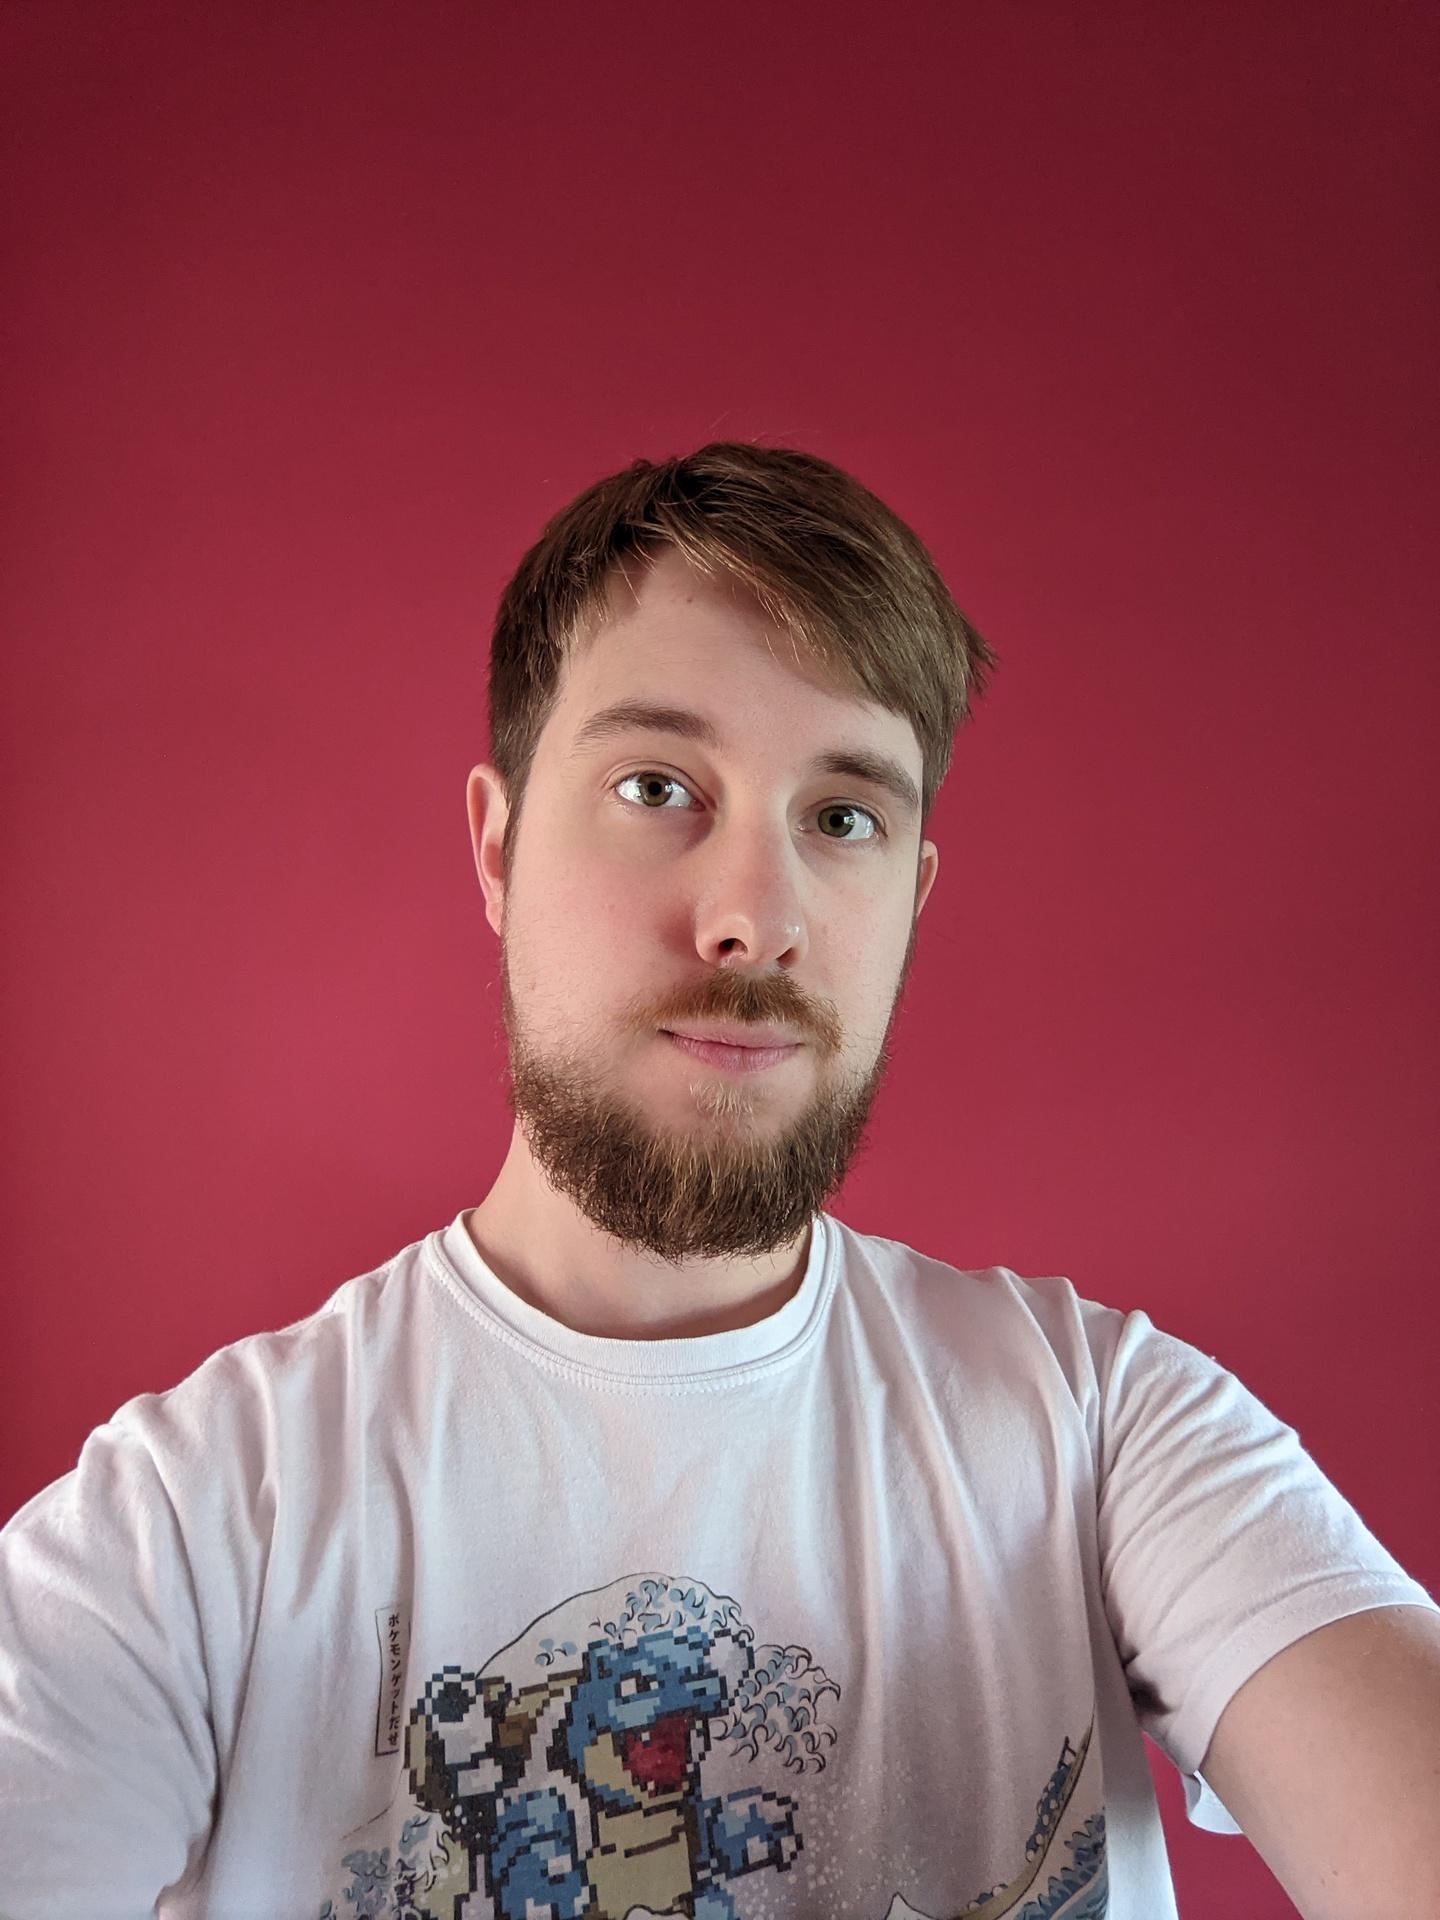 google pixel 4a 5g camera sample selfie